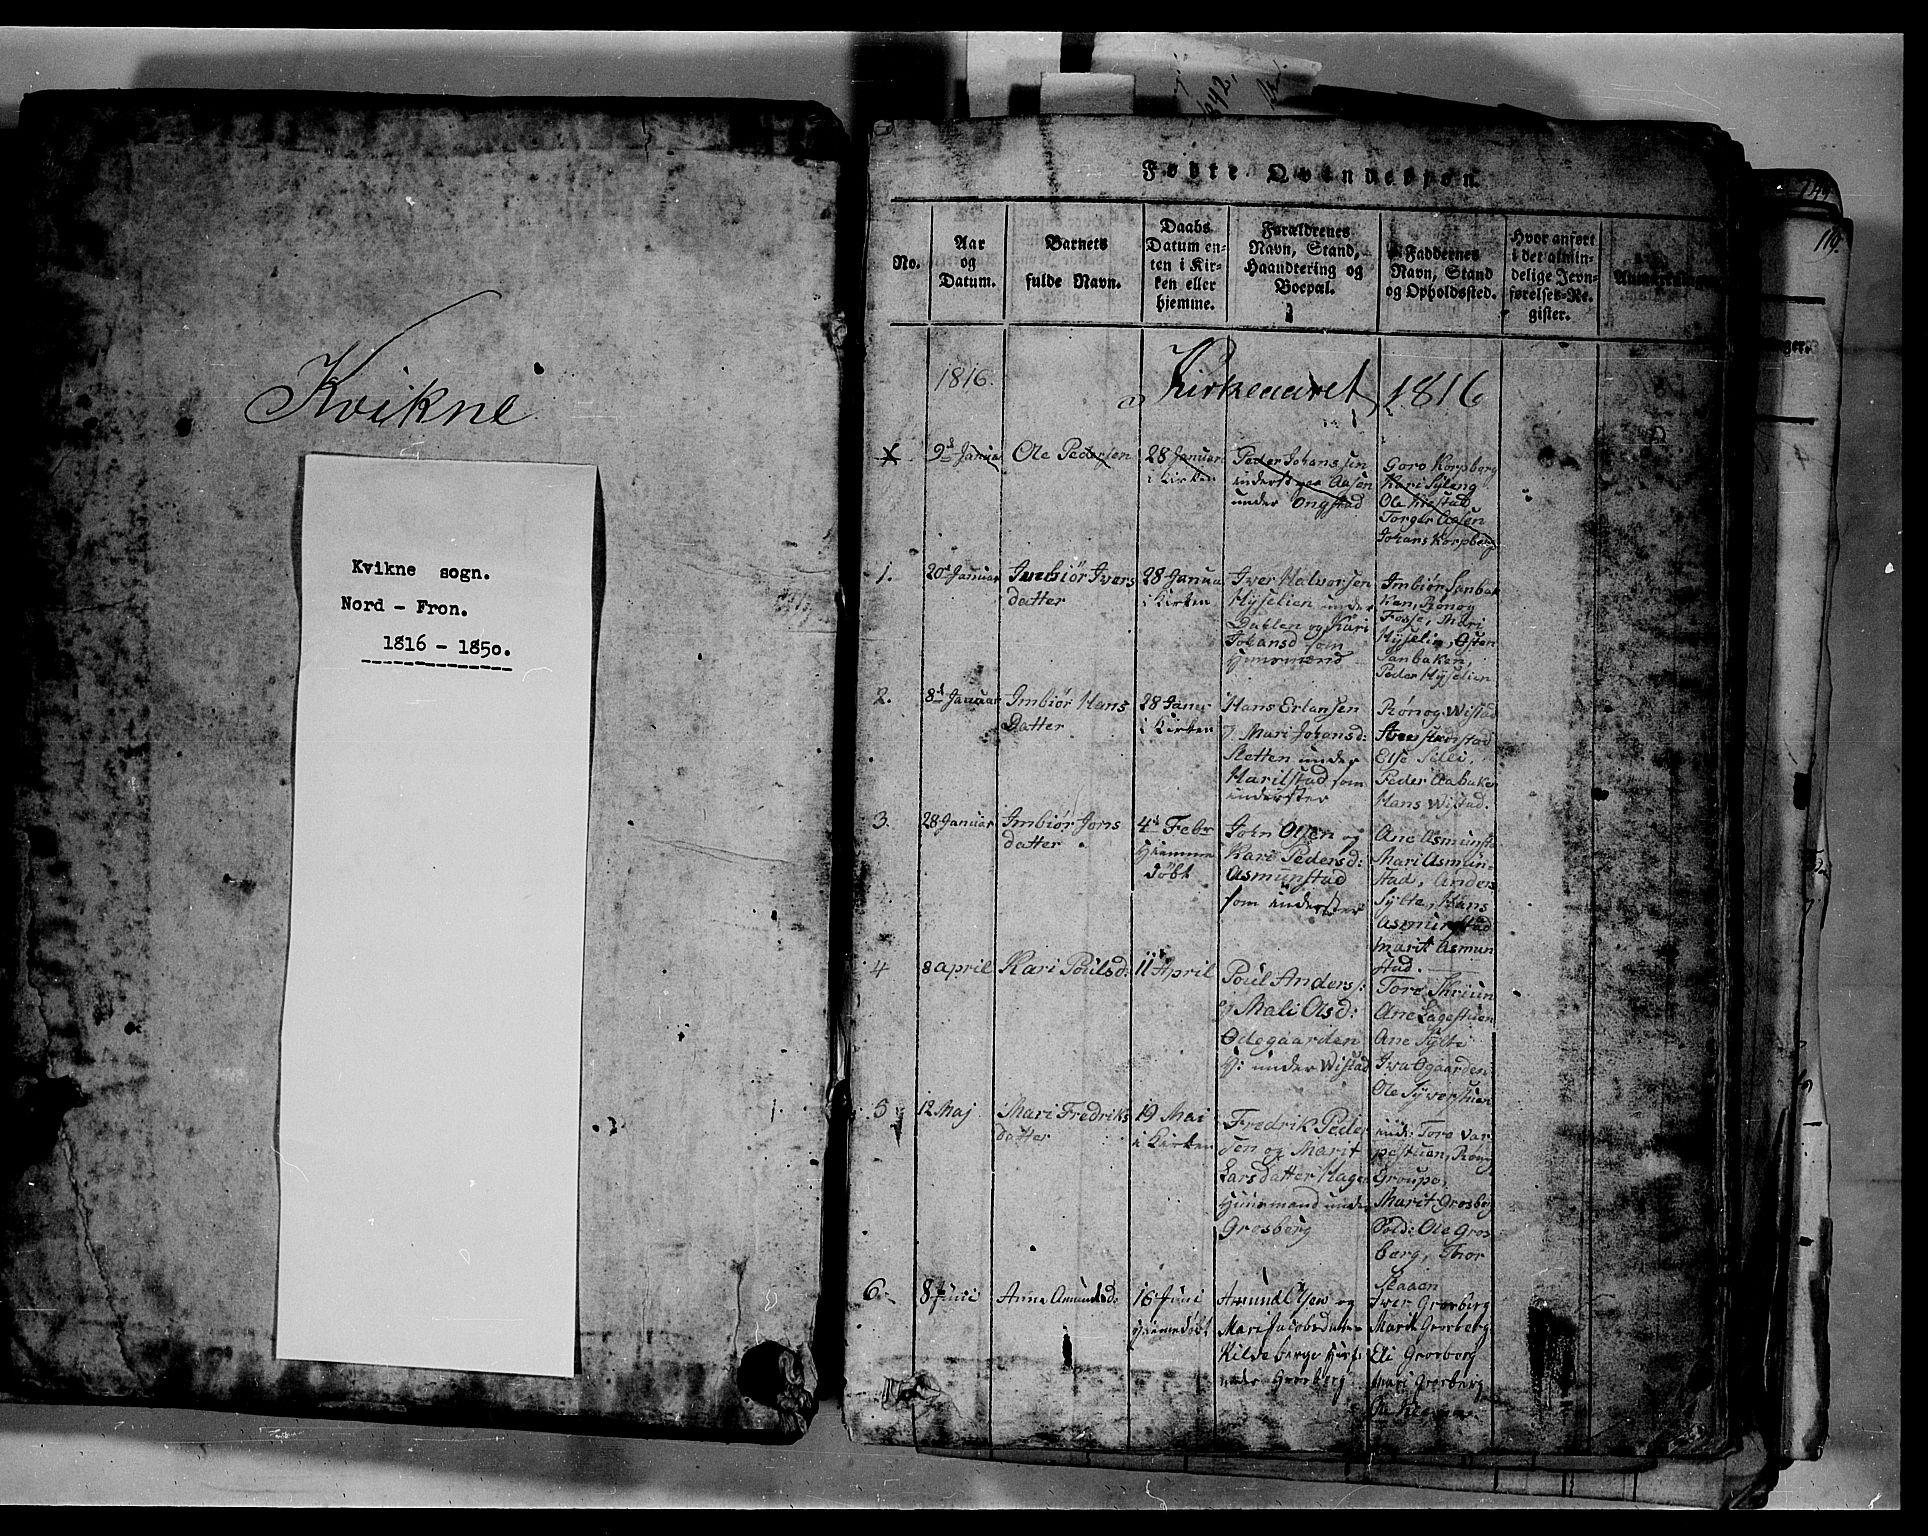 SAH, Fron prestekontor, H/Ha/Hab/L0003: Klokkerbok nr. 3, 1816-1850, s. 1